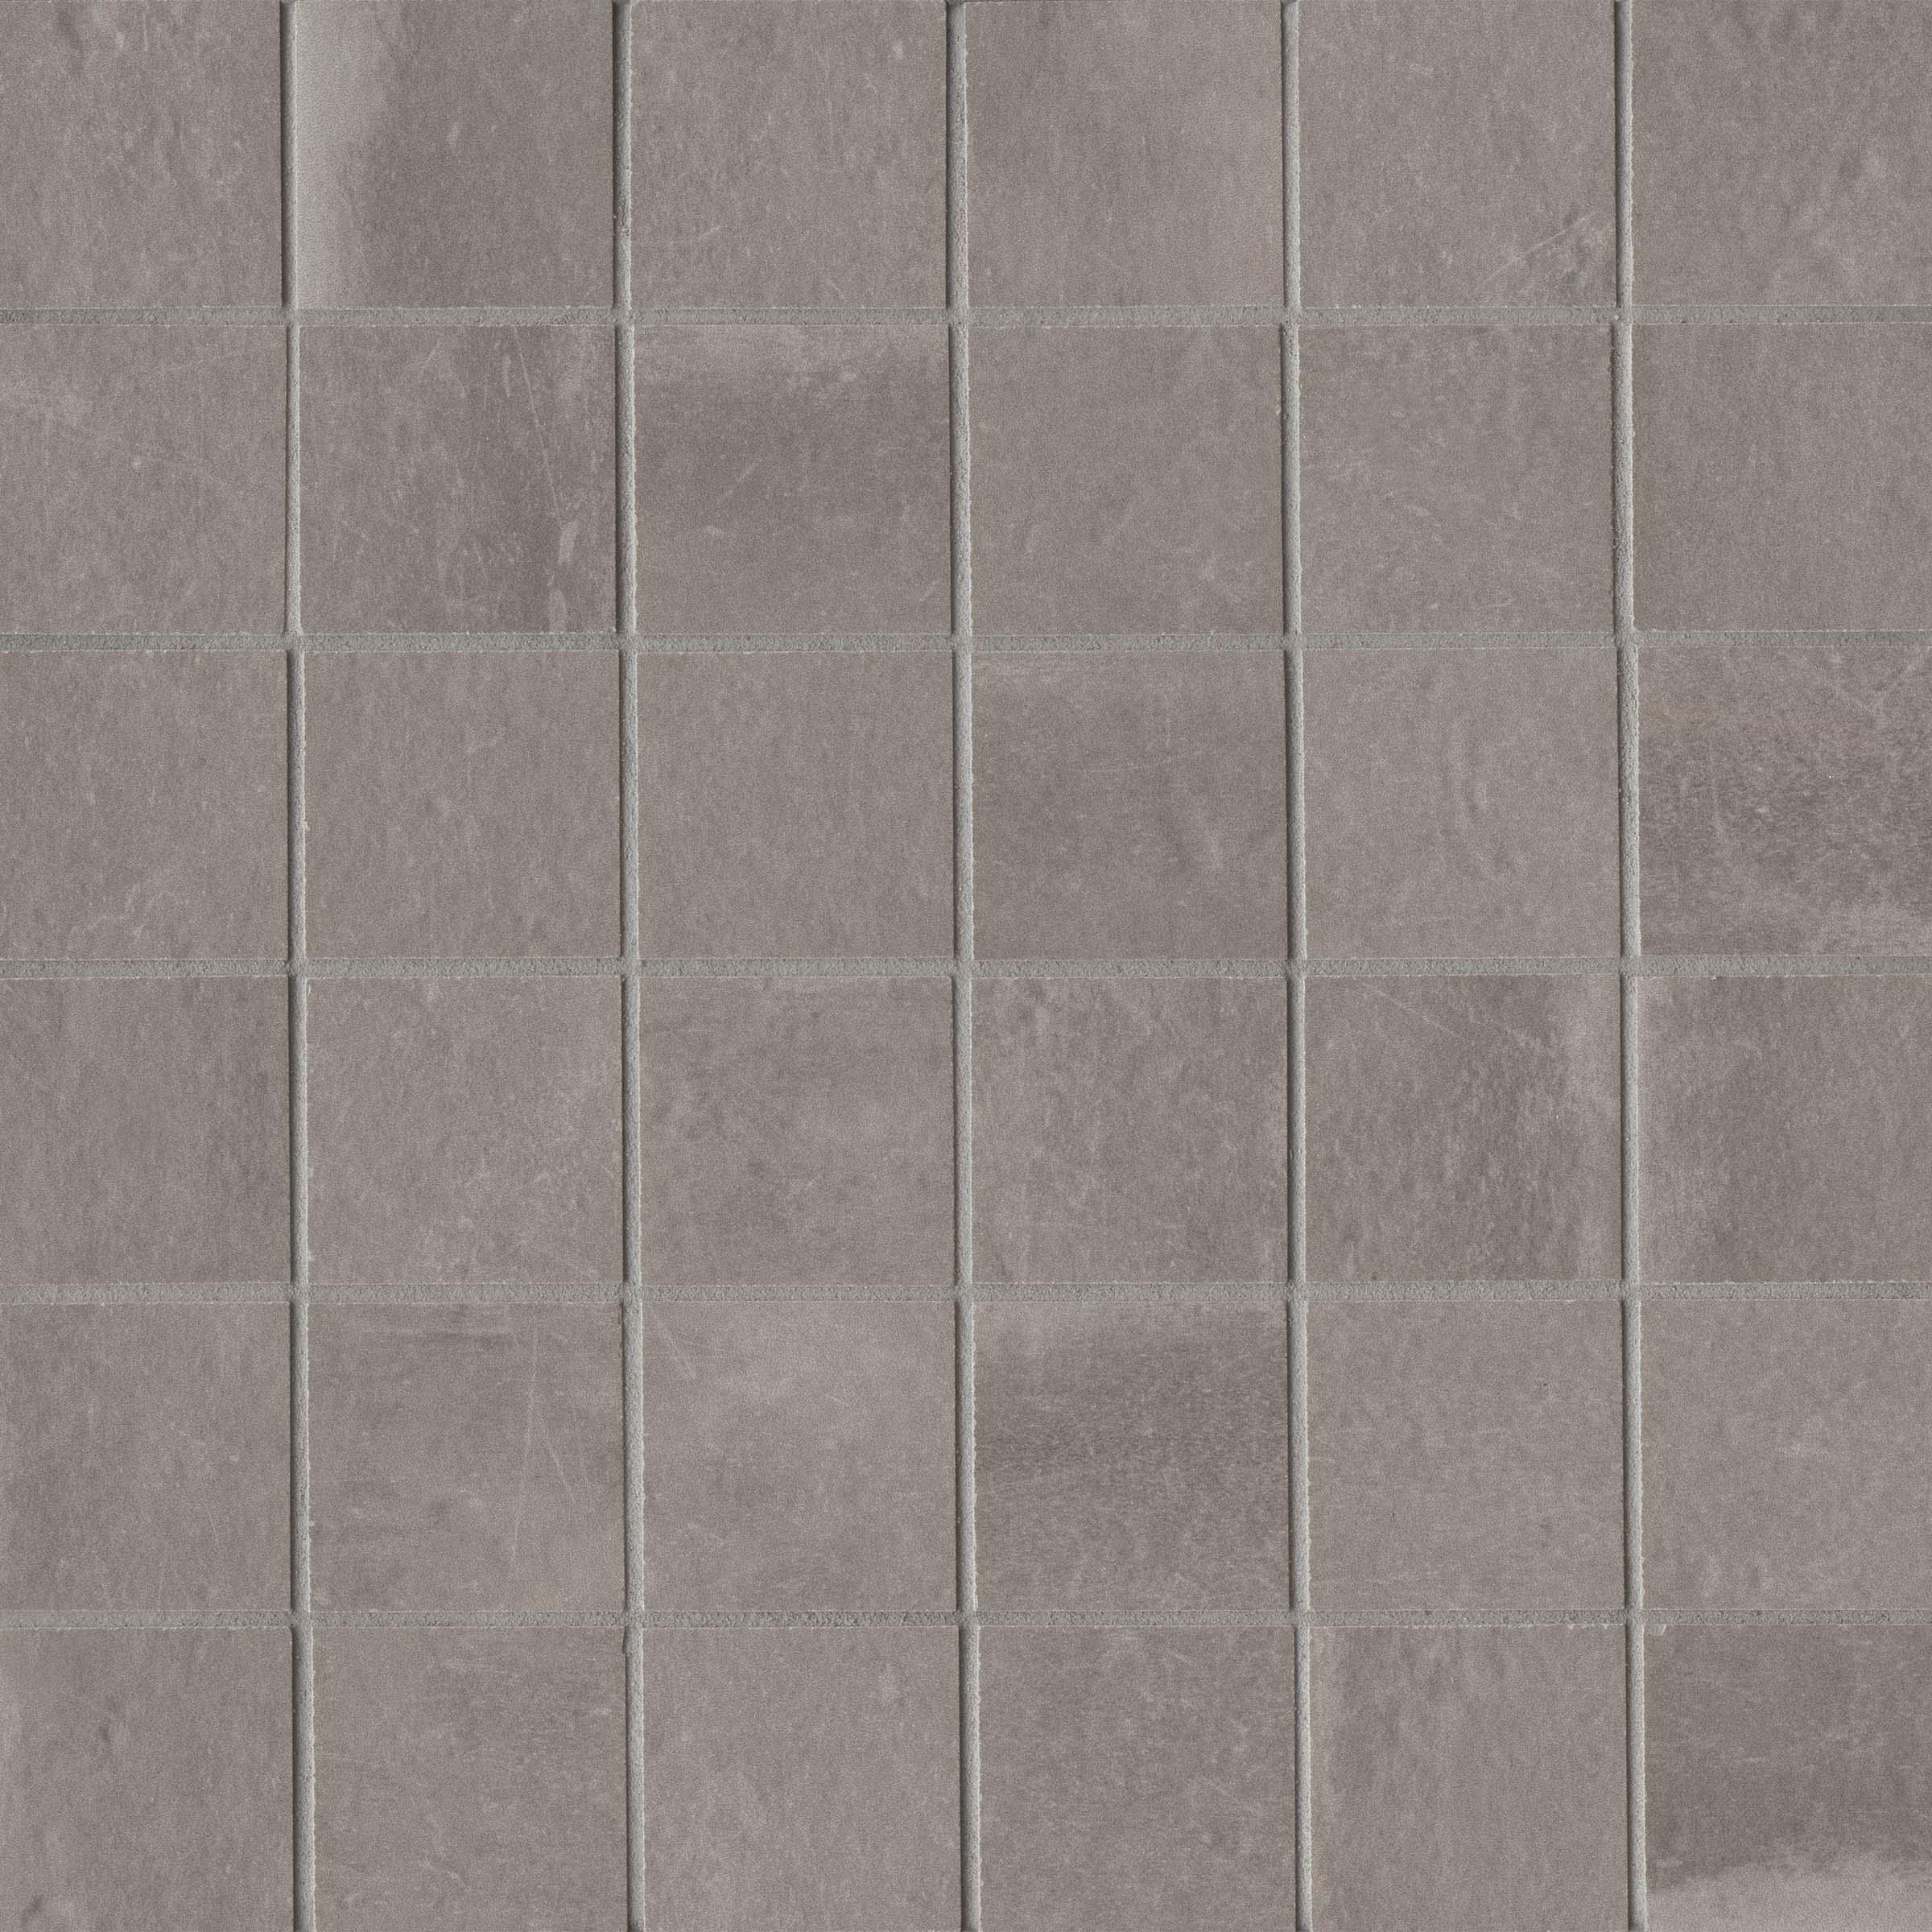 Palazzo 12 X 12 Decorative Tile In Vintage Grey Florentina